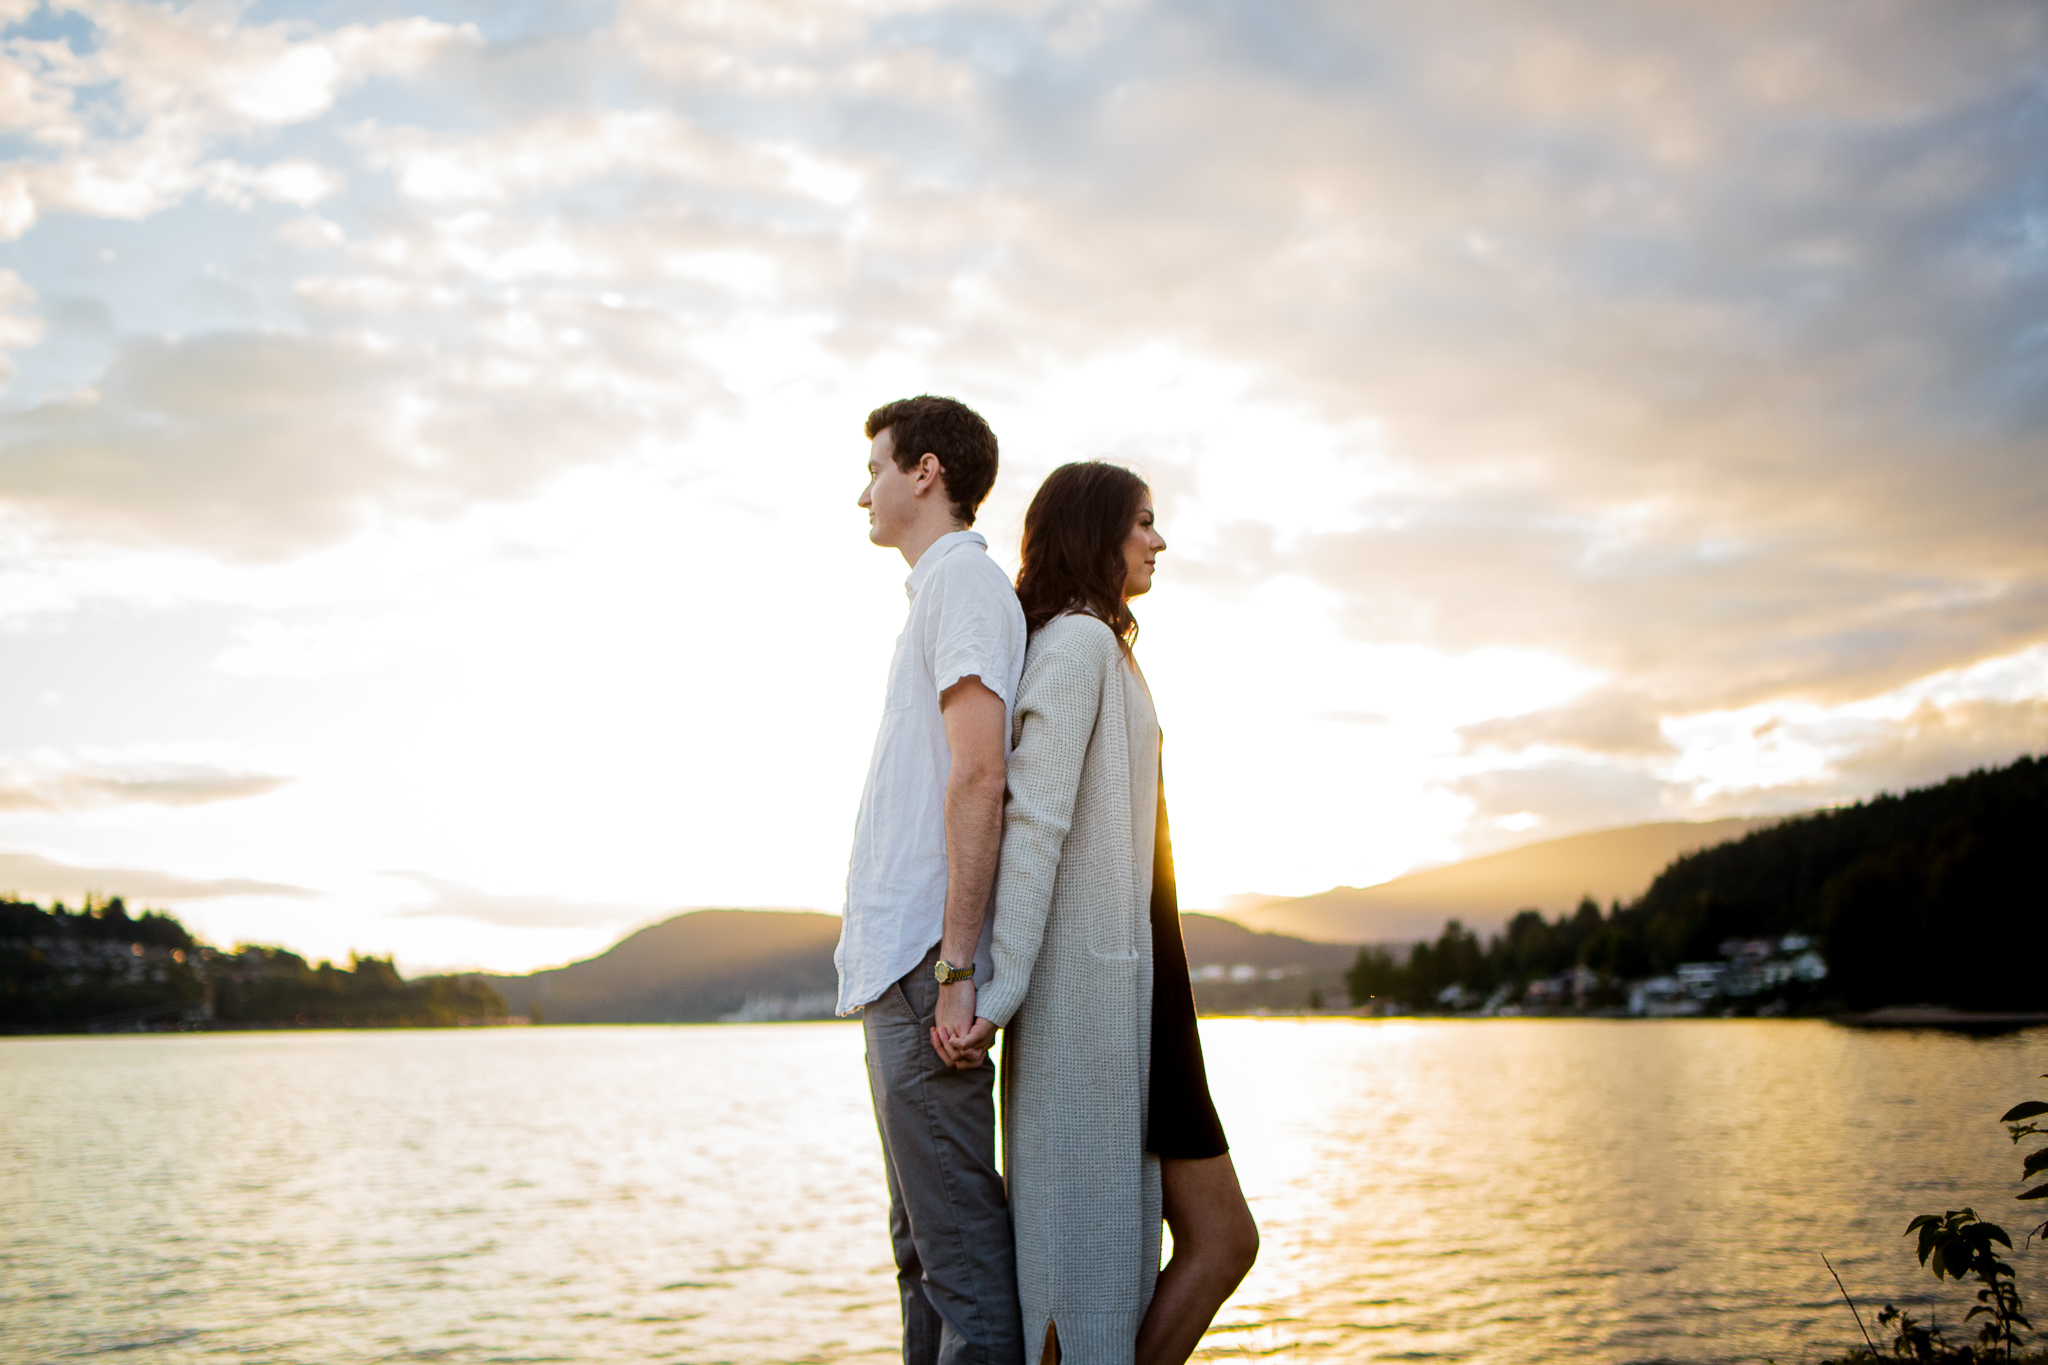 Photo of Buntzen Lake Anmore British Columbia Landscape Best Fun Engagement Photographer Port Moody Wedding Sunset Romantic Couple Photos 199.jpg